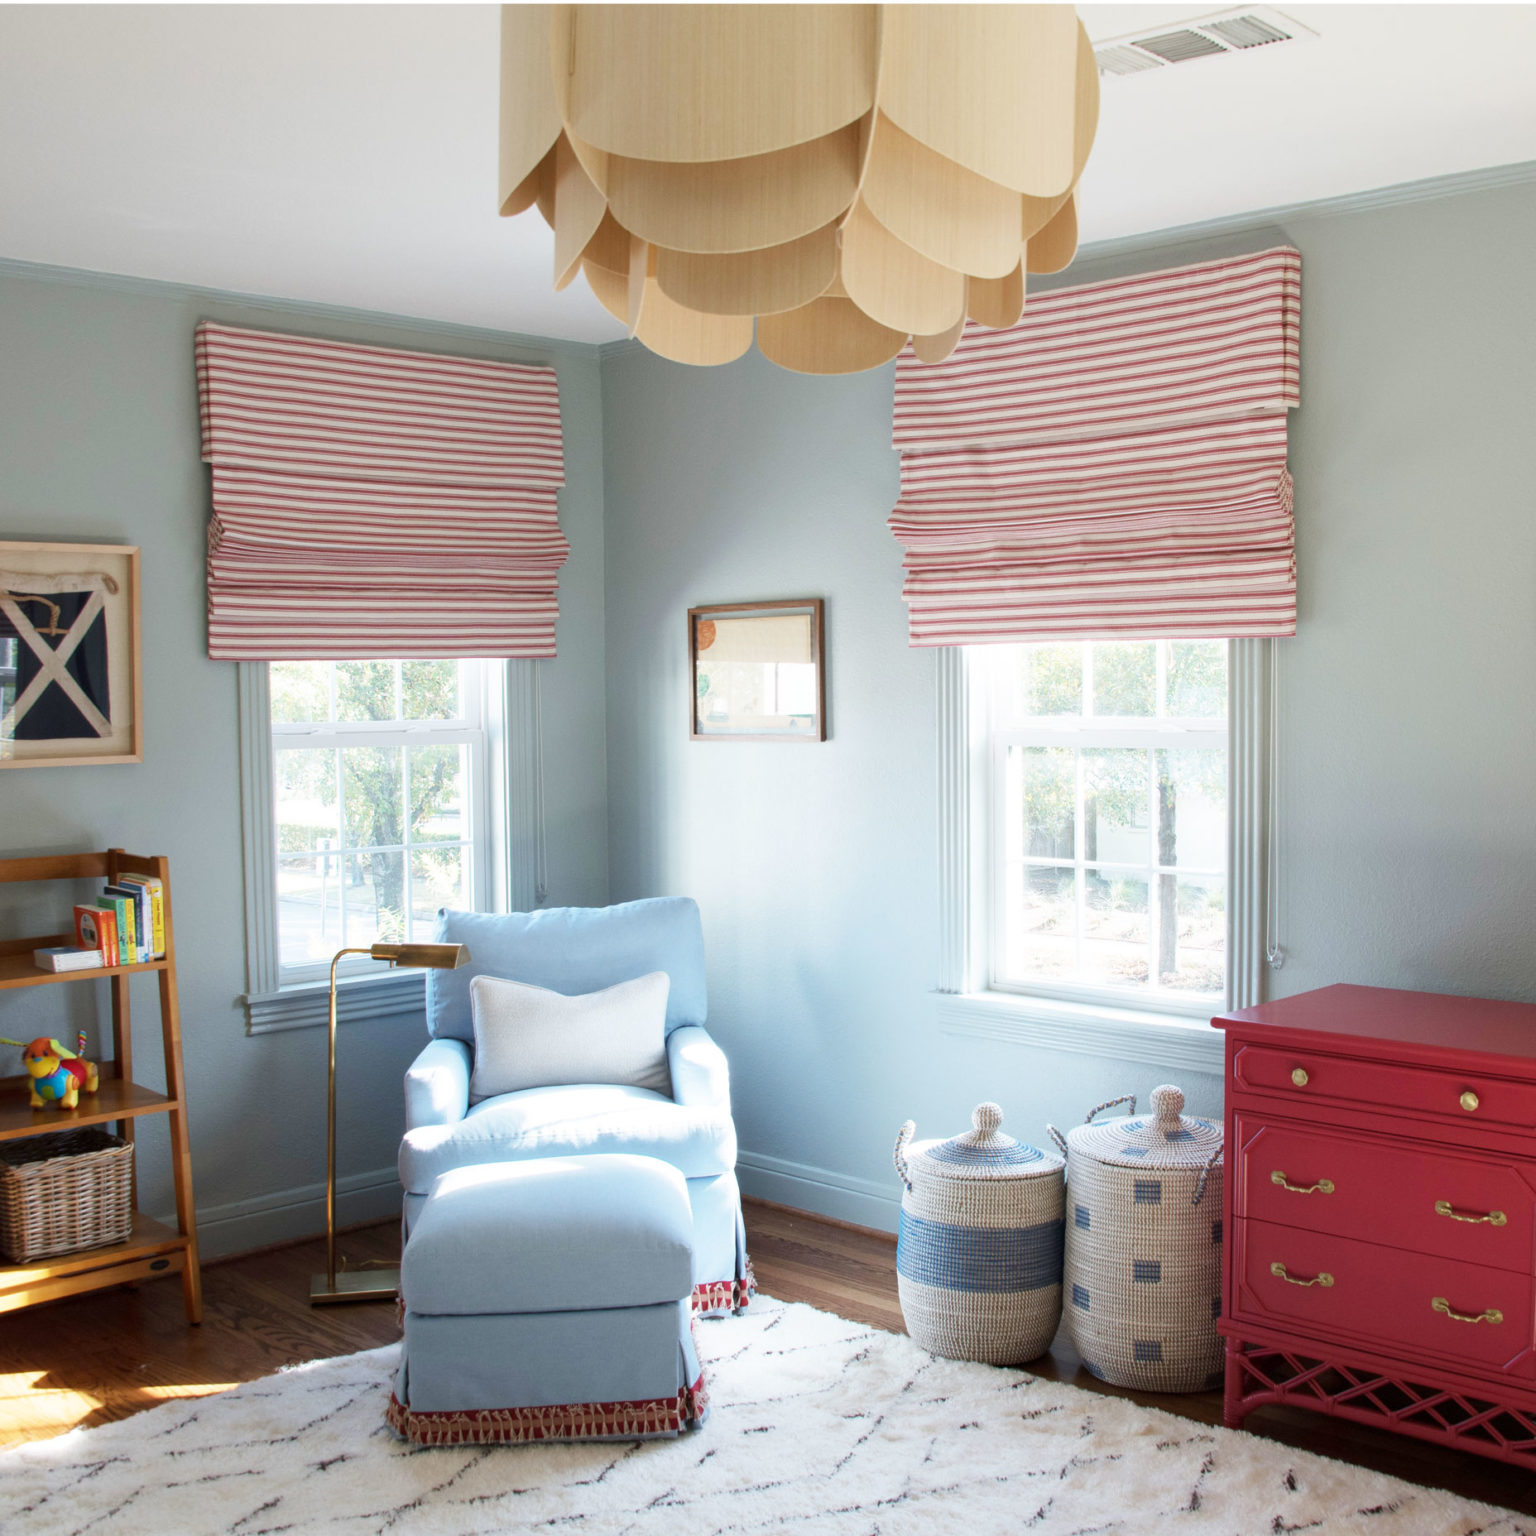 Twosdays – 1 room 2 price points – Adventurous Nursery